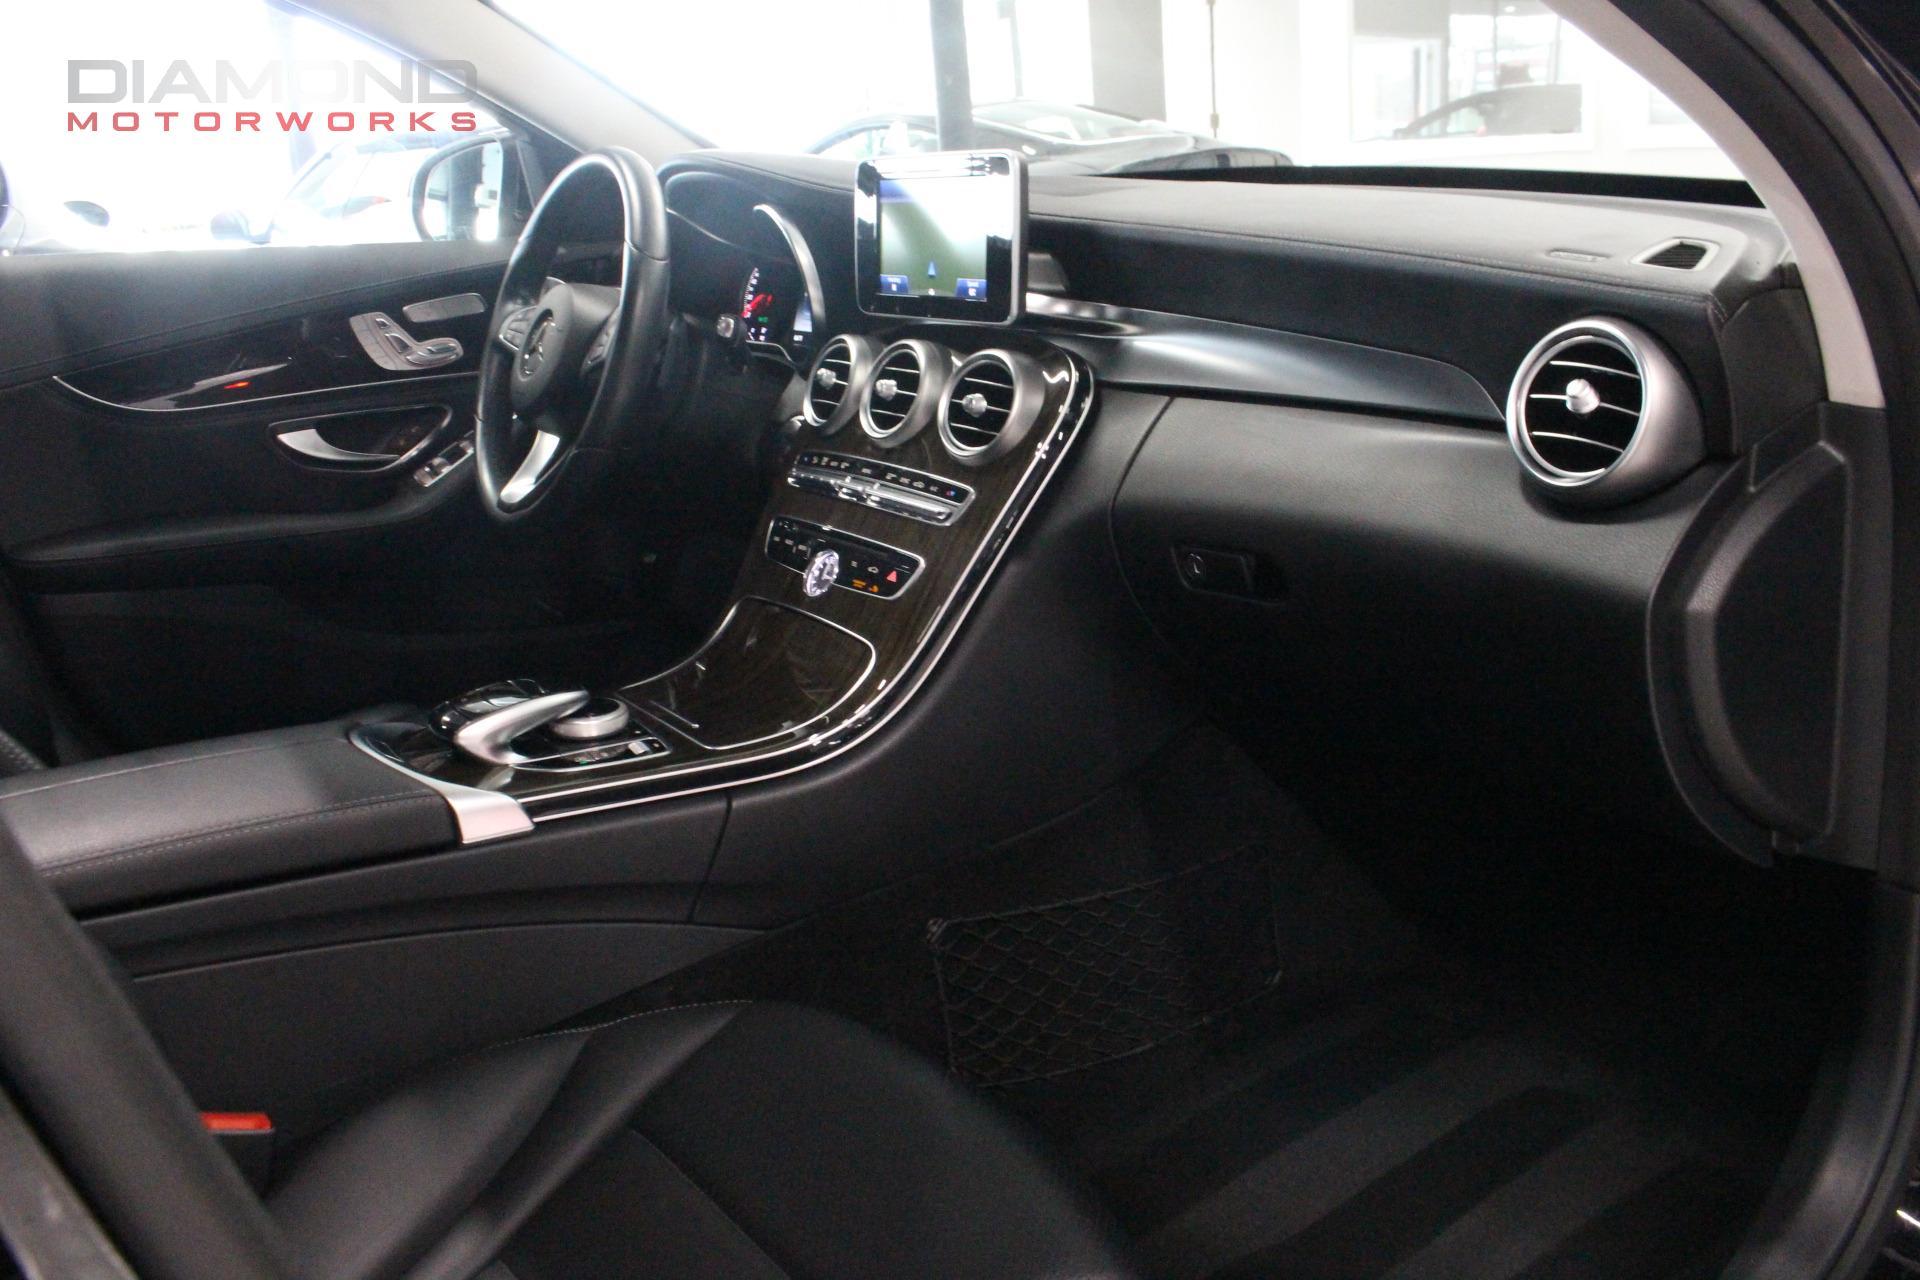 2015 Mercedes Benz C Class C 300 4MATIC Stock for sale near